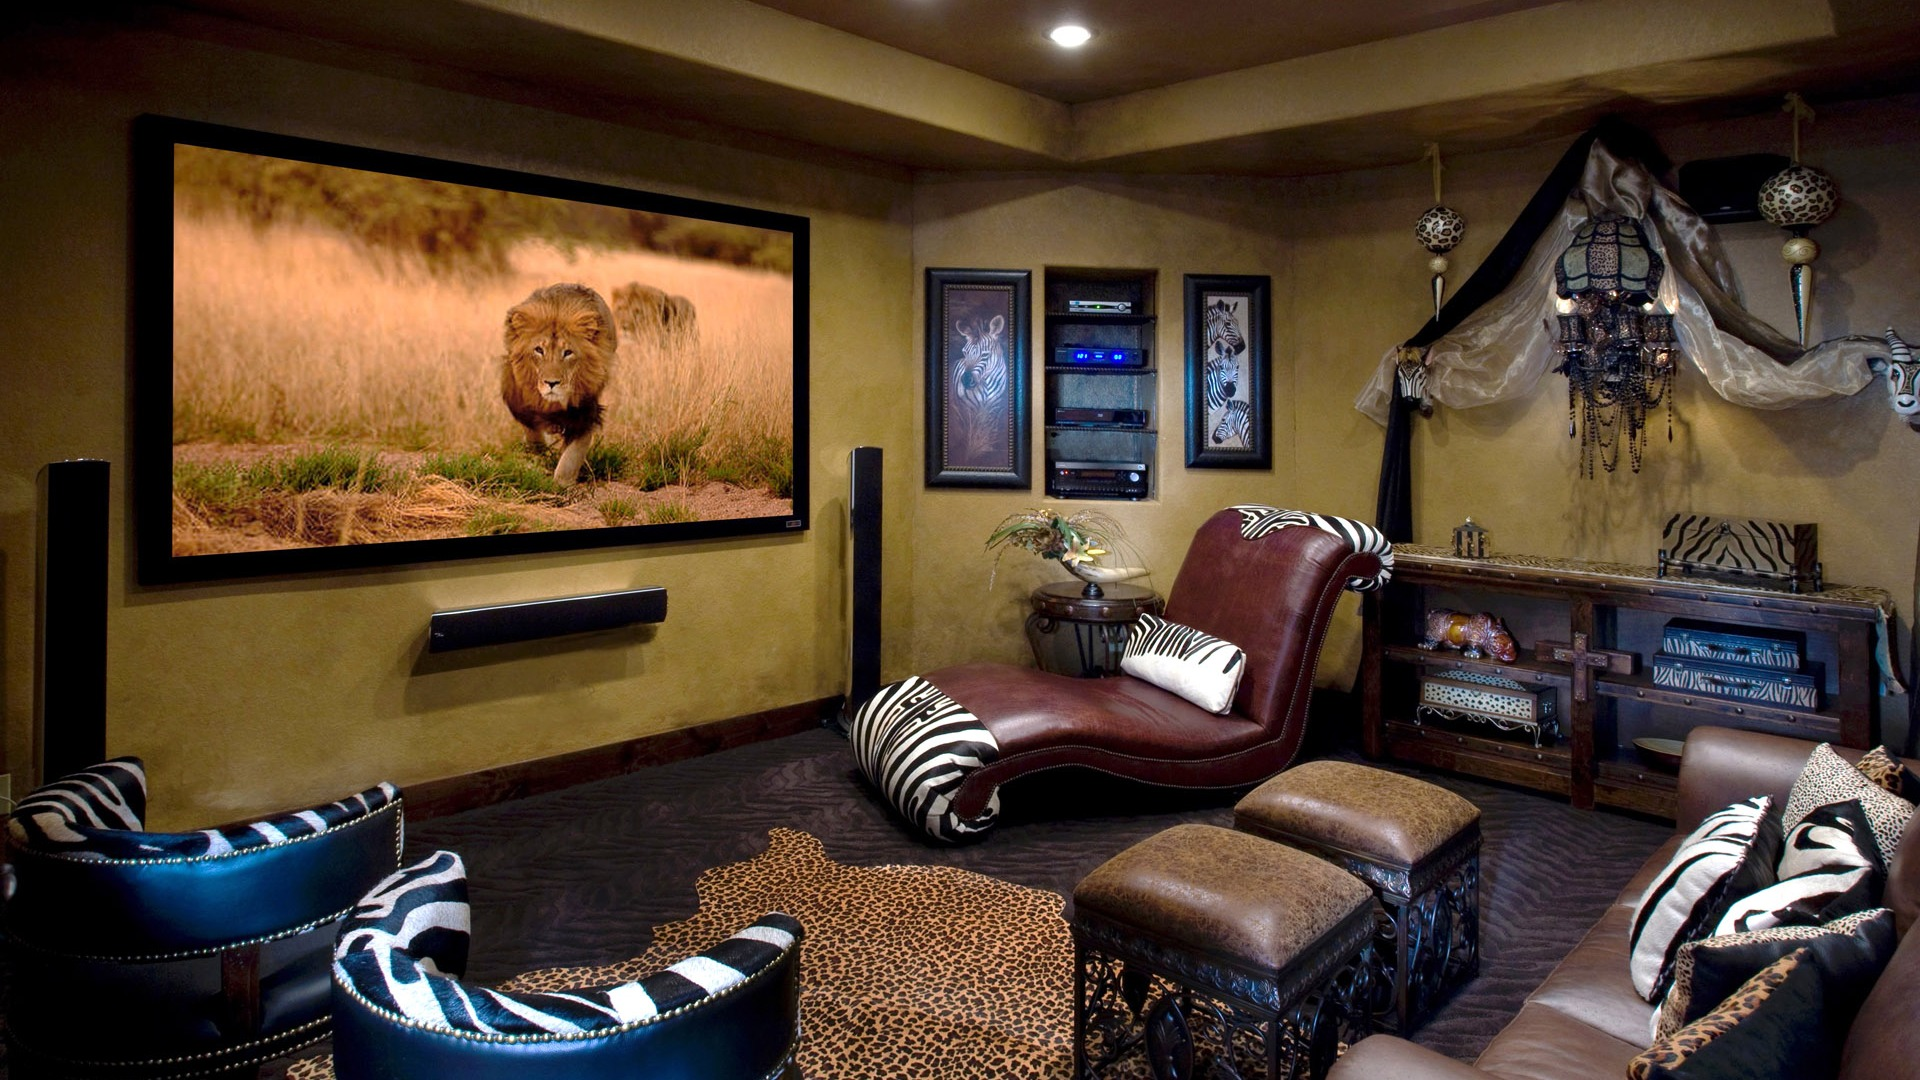 Fondo de pantalla de cine en casa (1) #20 - 1920x1080 Fondos de ...